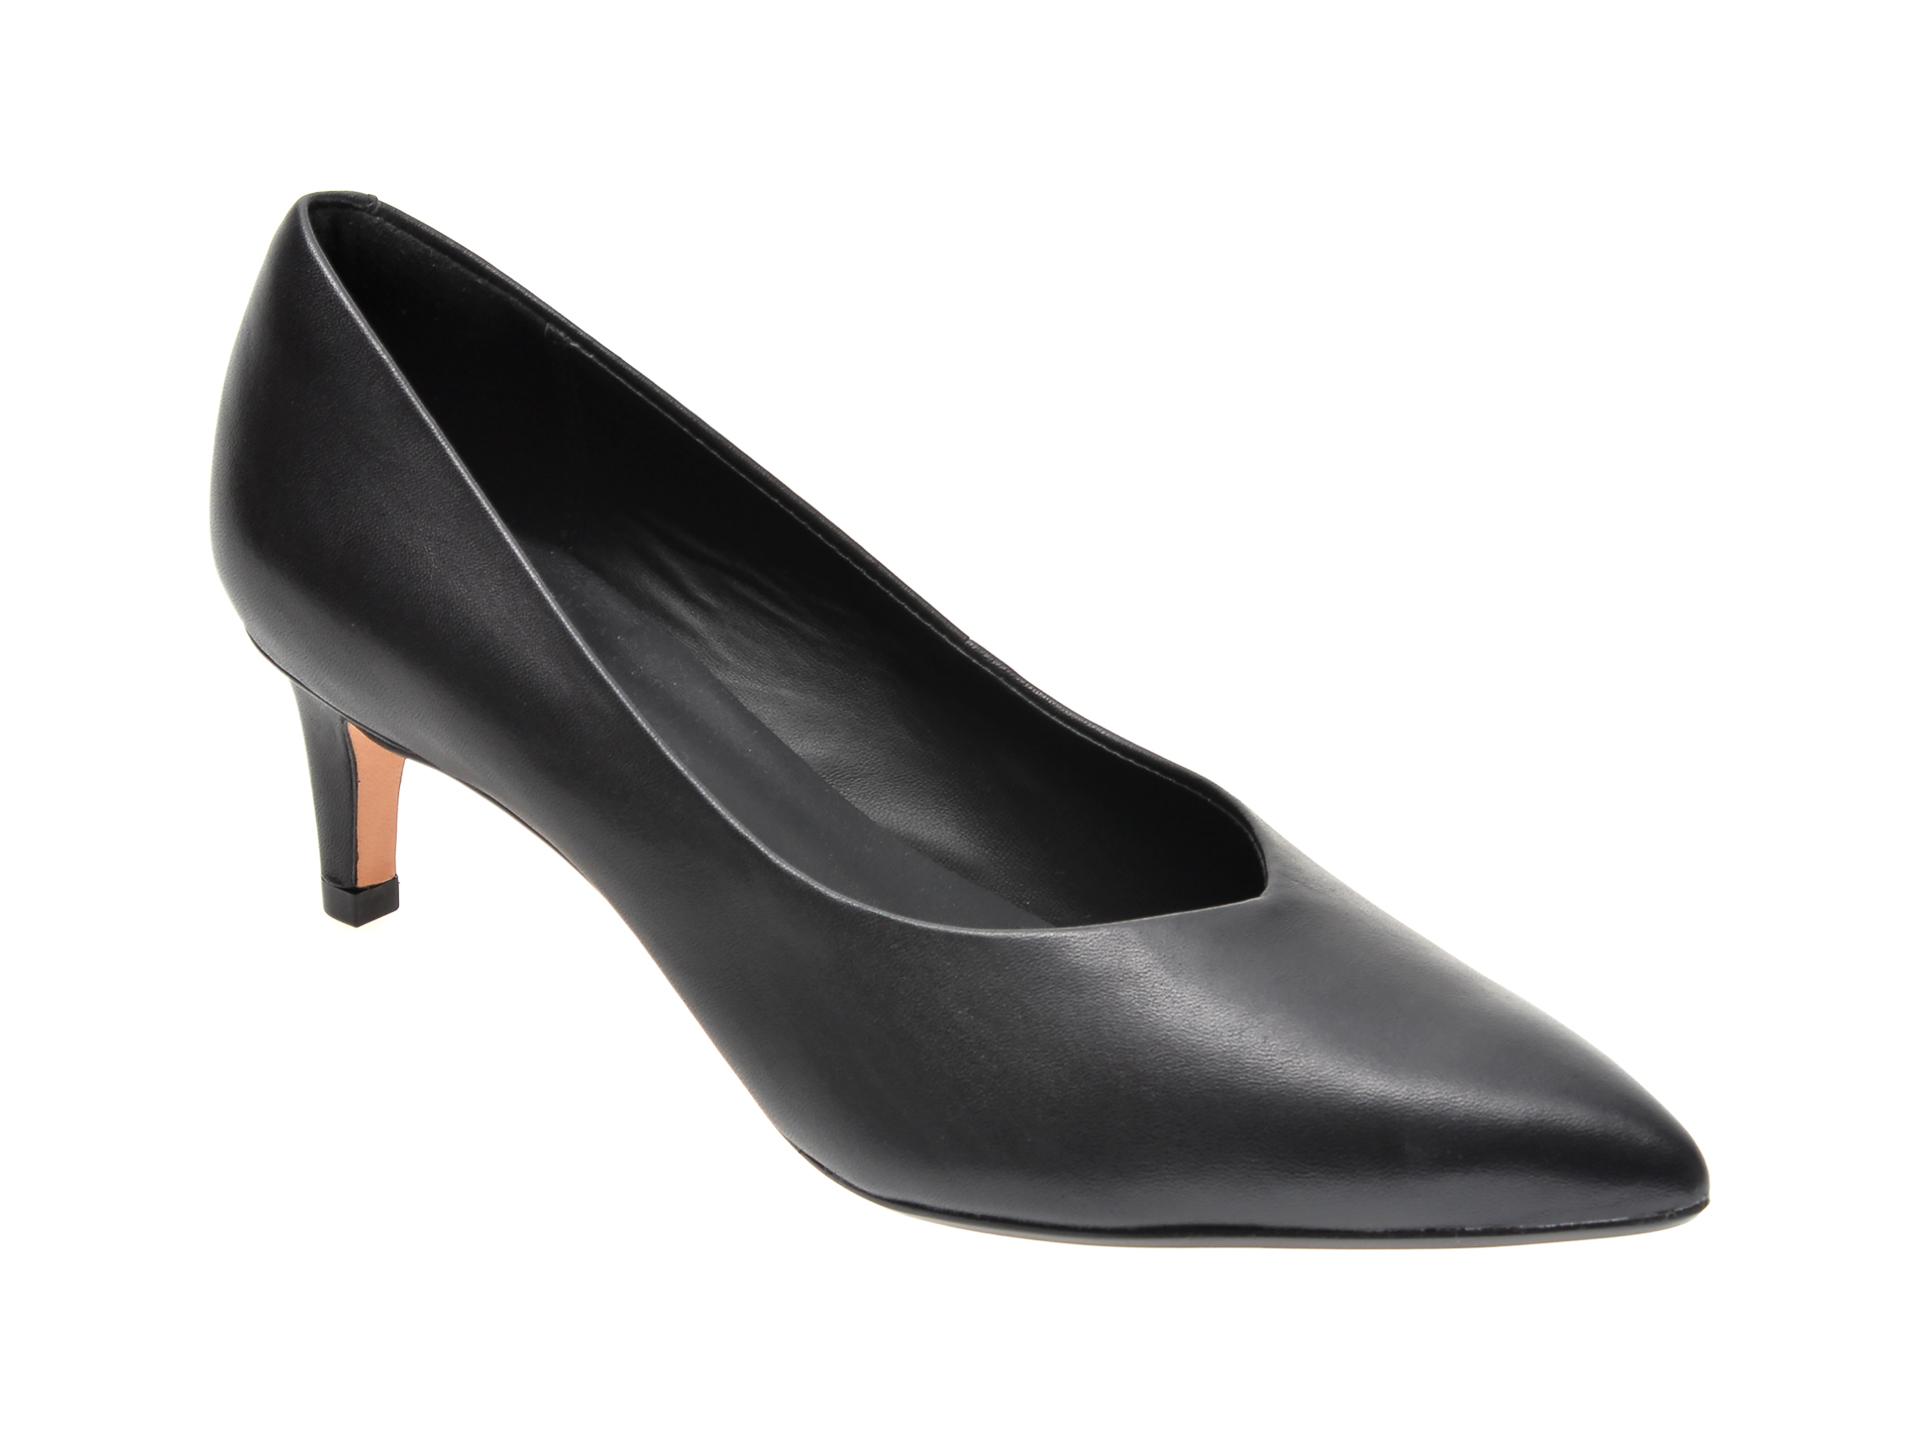 Pantofi CLARKS negri, LAI55C2, din piele naturala imagine